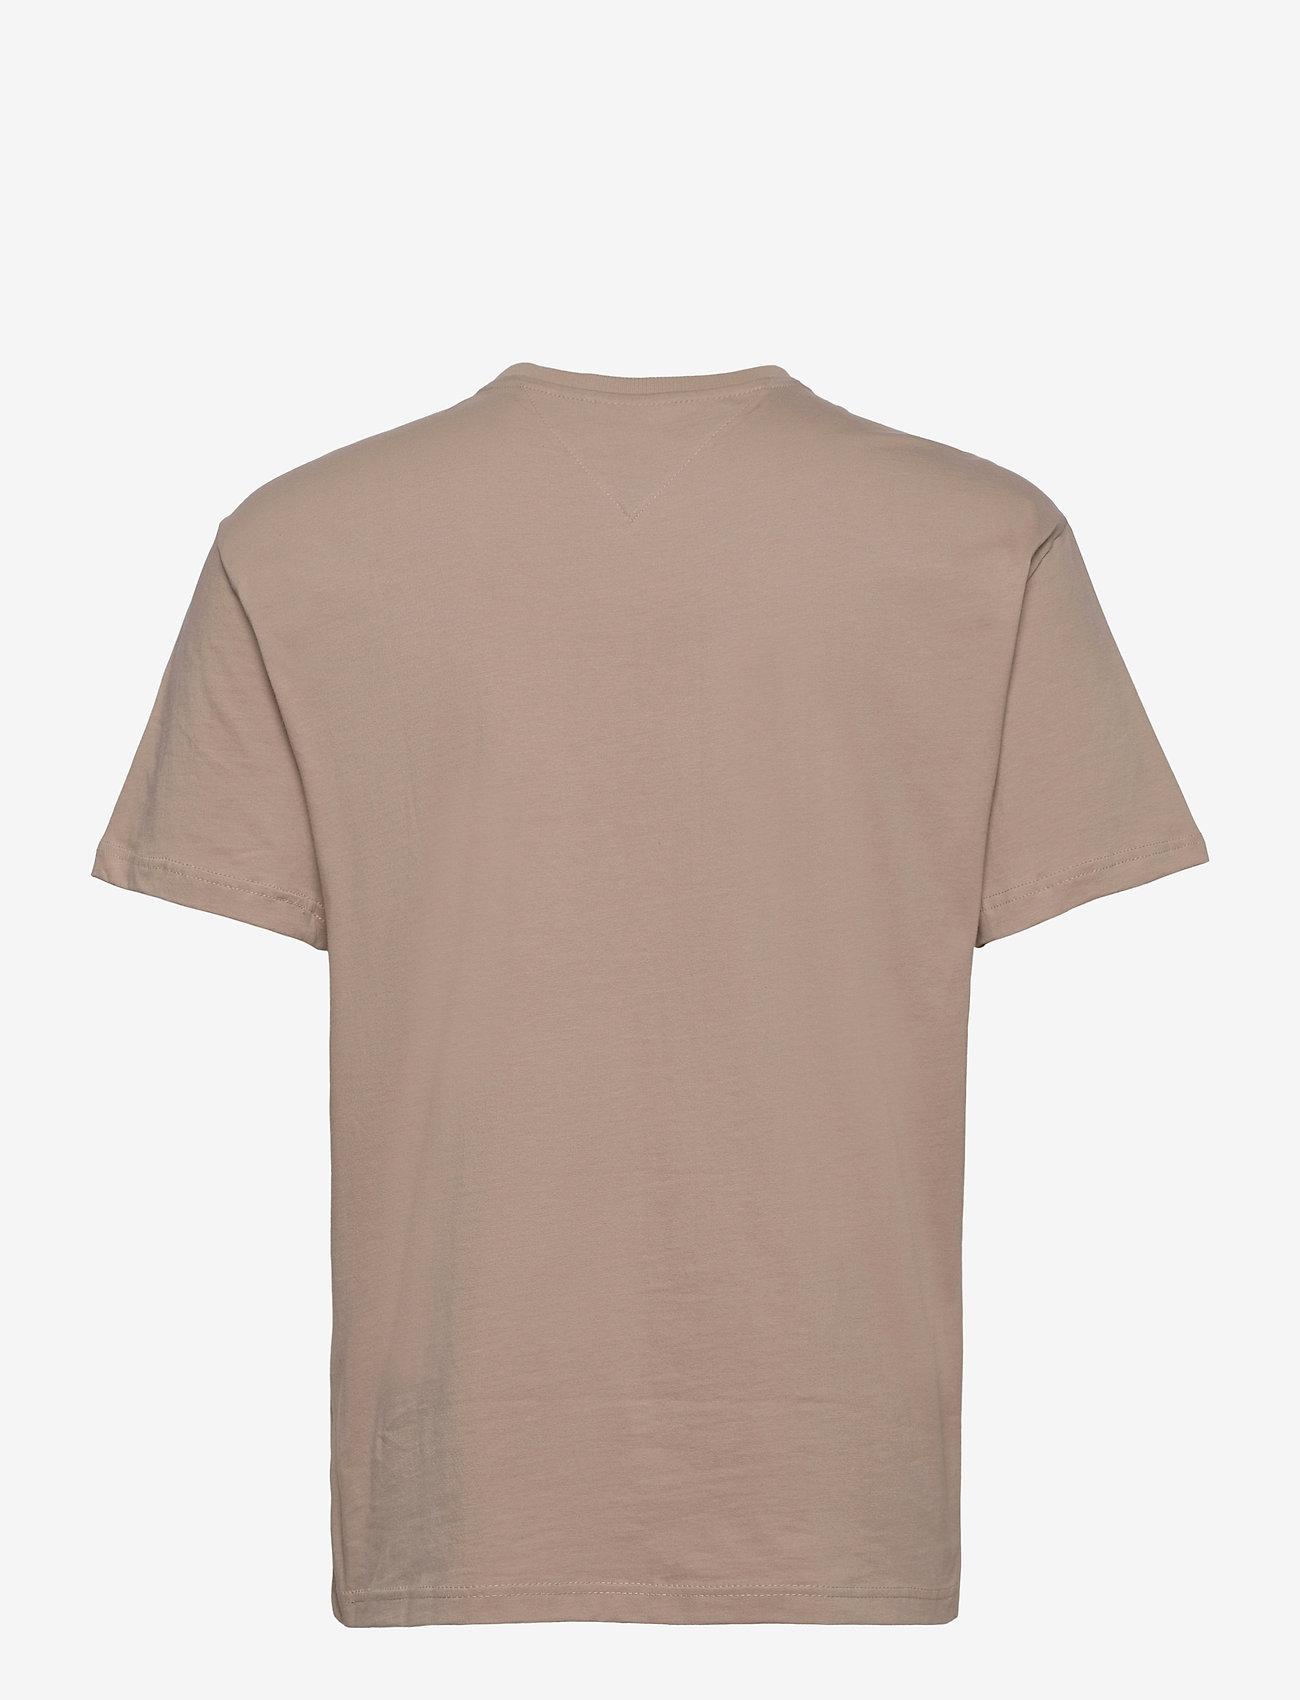 Tommy Jeans - TJM GEL LINEAR LOGO TEE - basic t-shirts - soft beige - 1